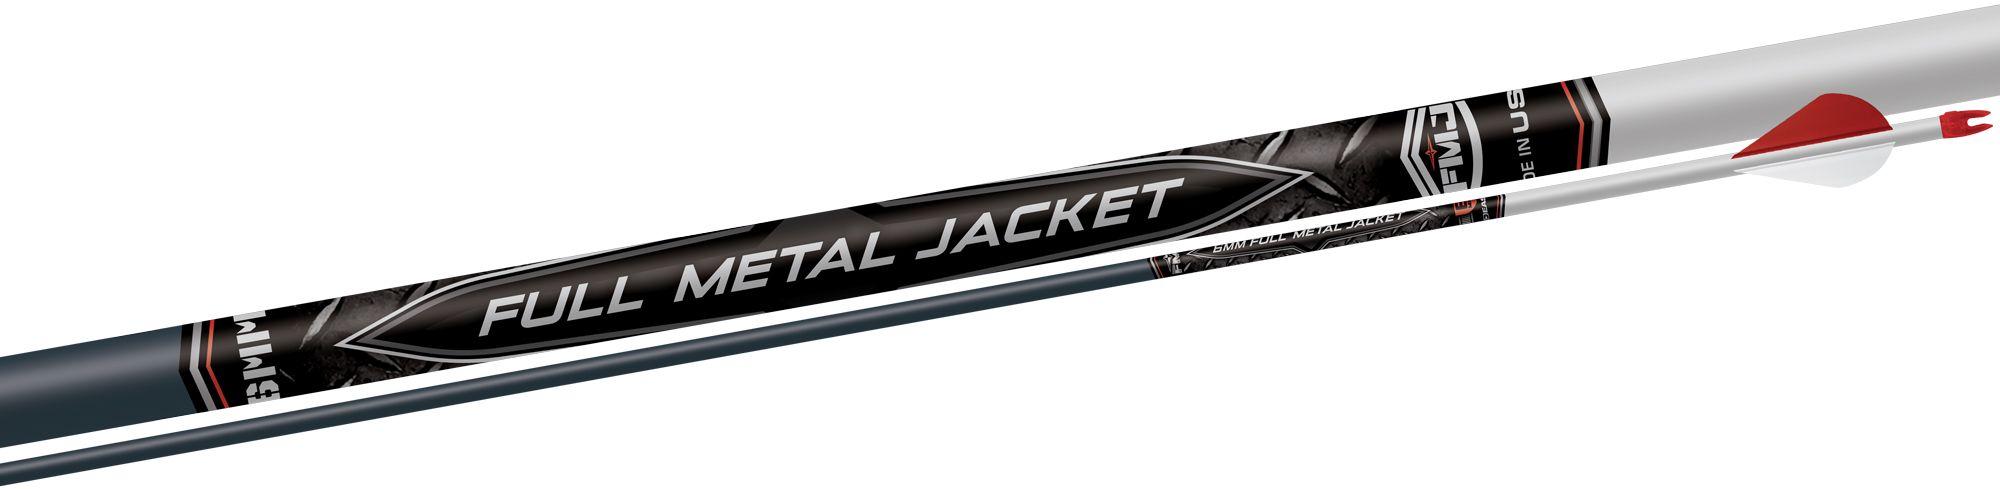 Easton 6MM Full Metal Jacket Arrows, Size: 390 thumbnail